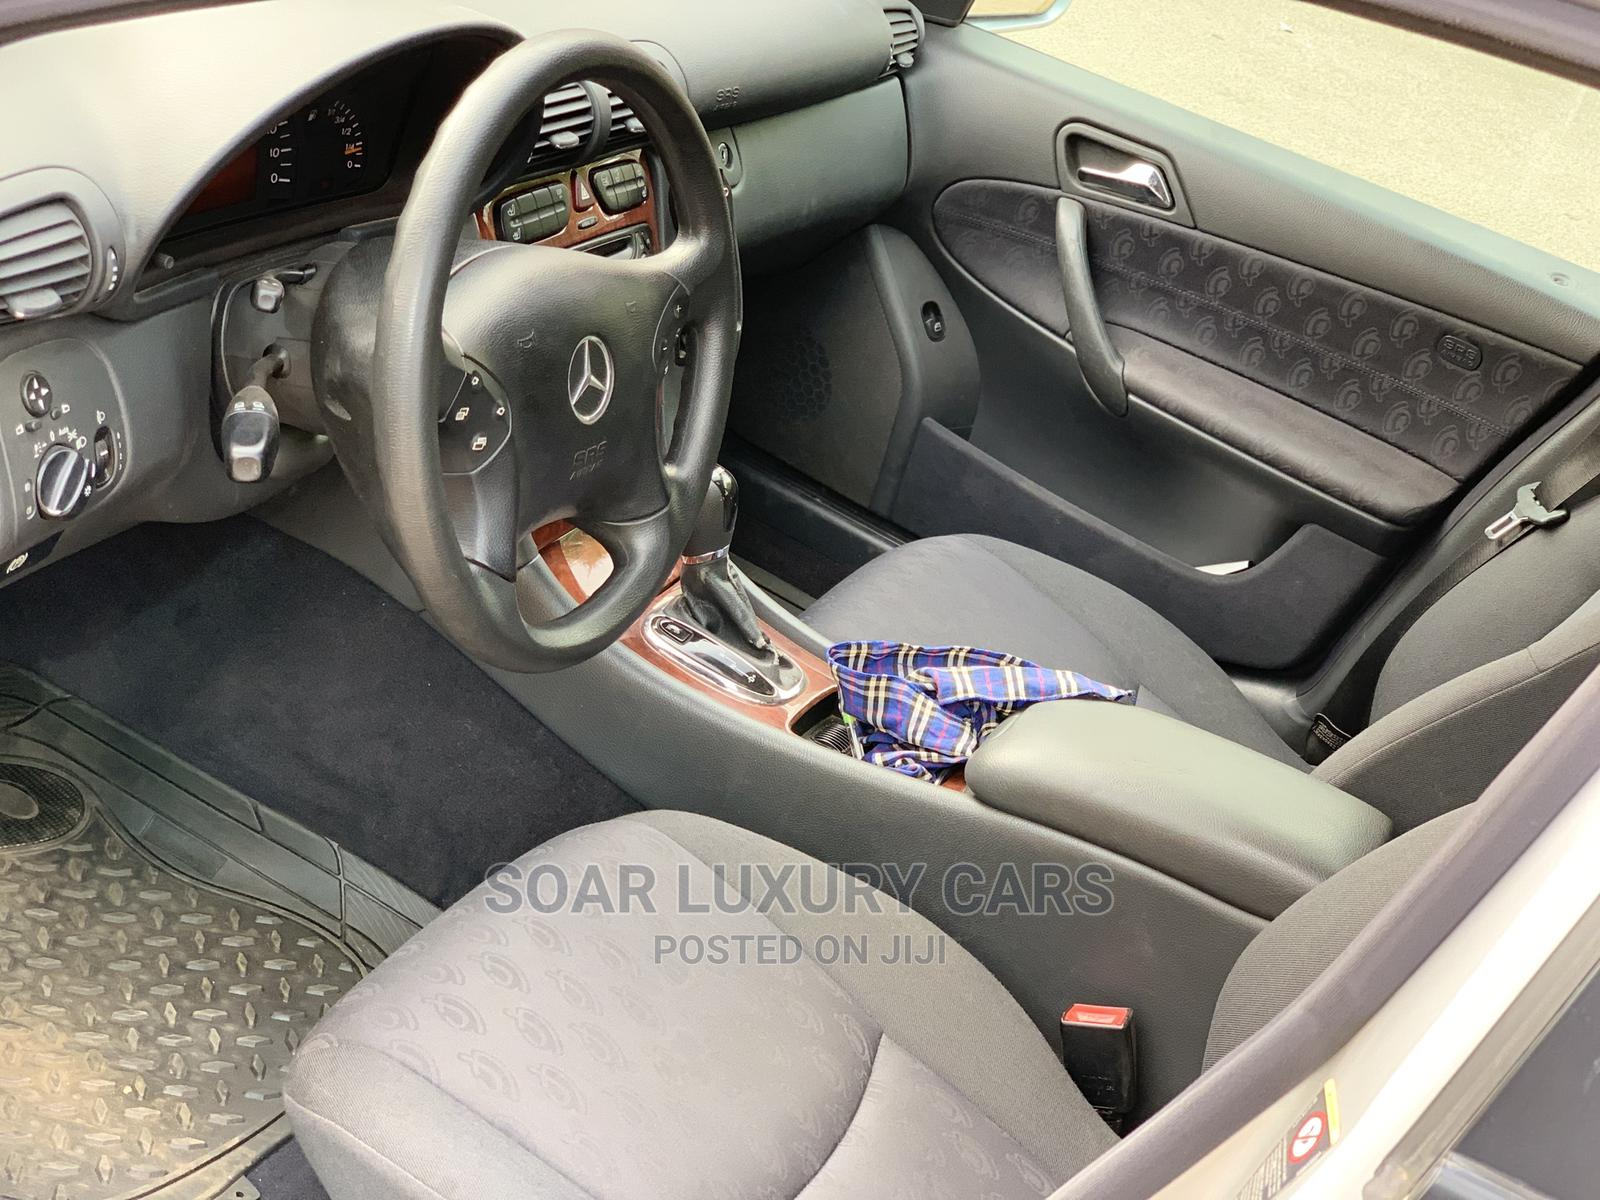 Archive: Mercedes-Benz C180 2004 Silver